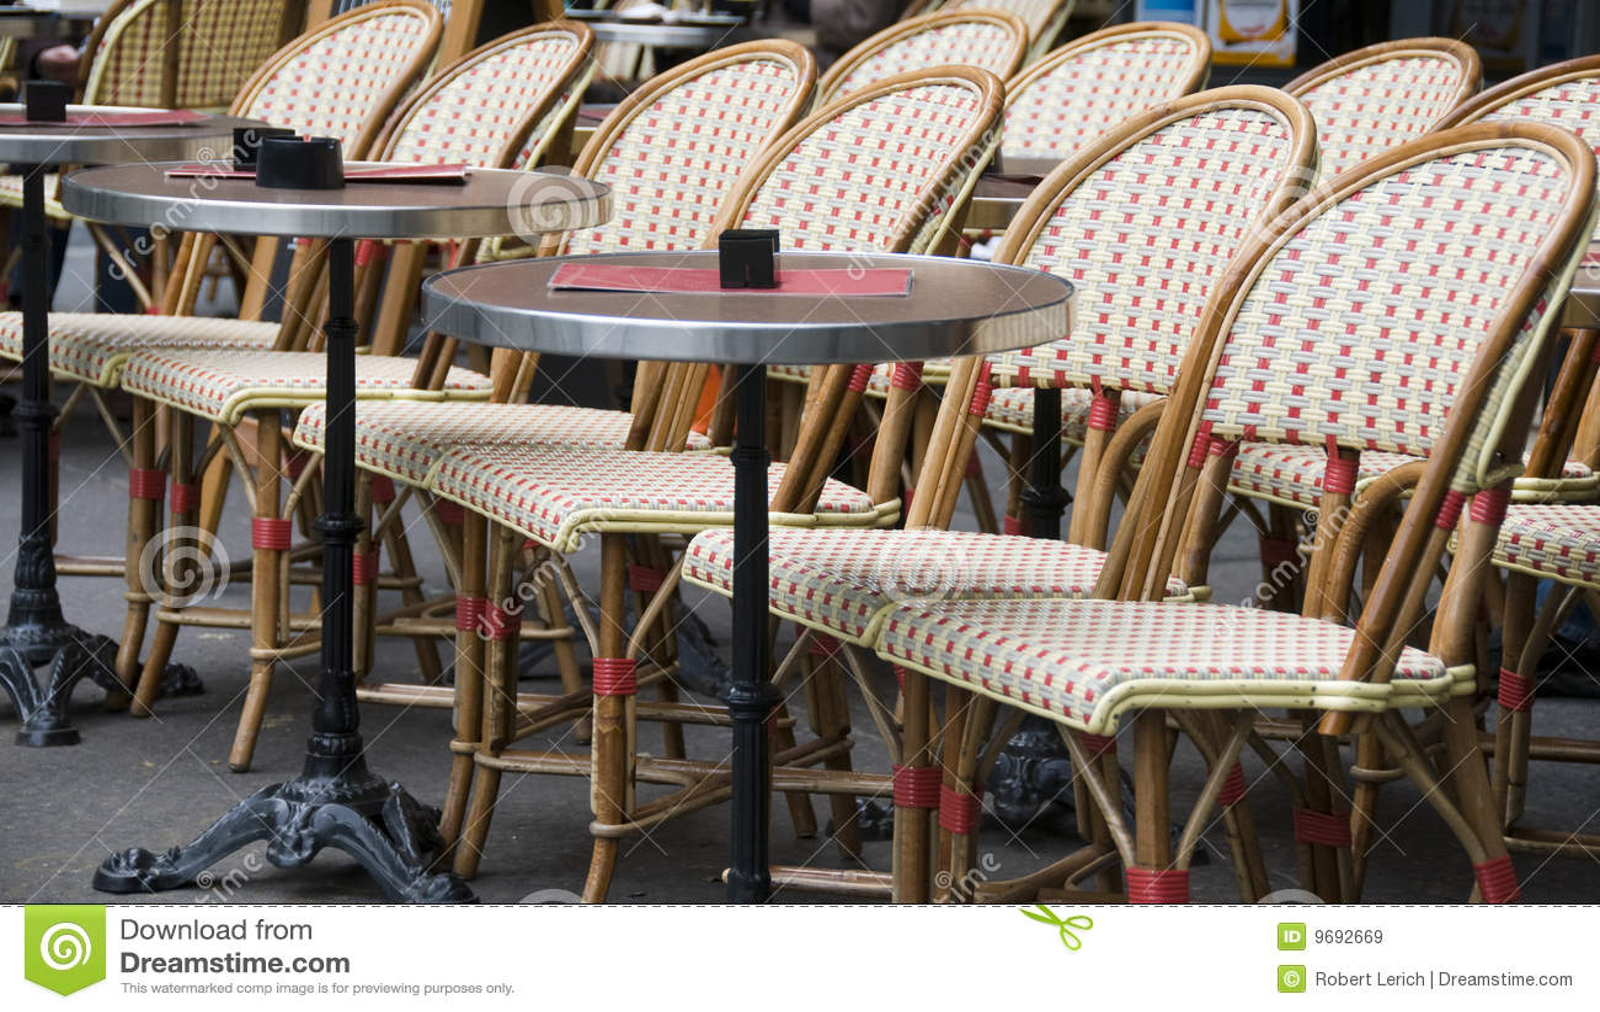 Paris Sidewalk Cafe Chairs